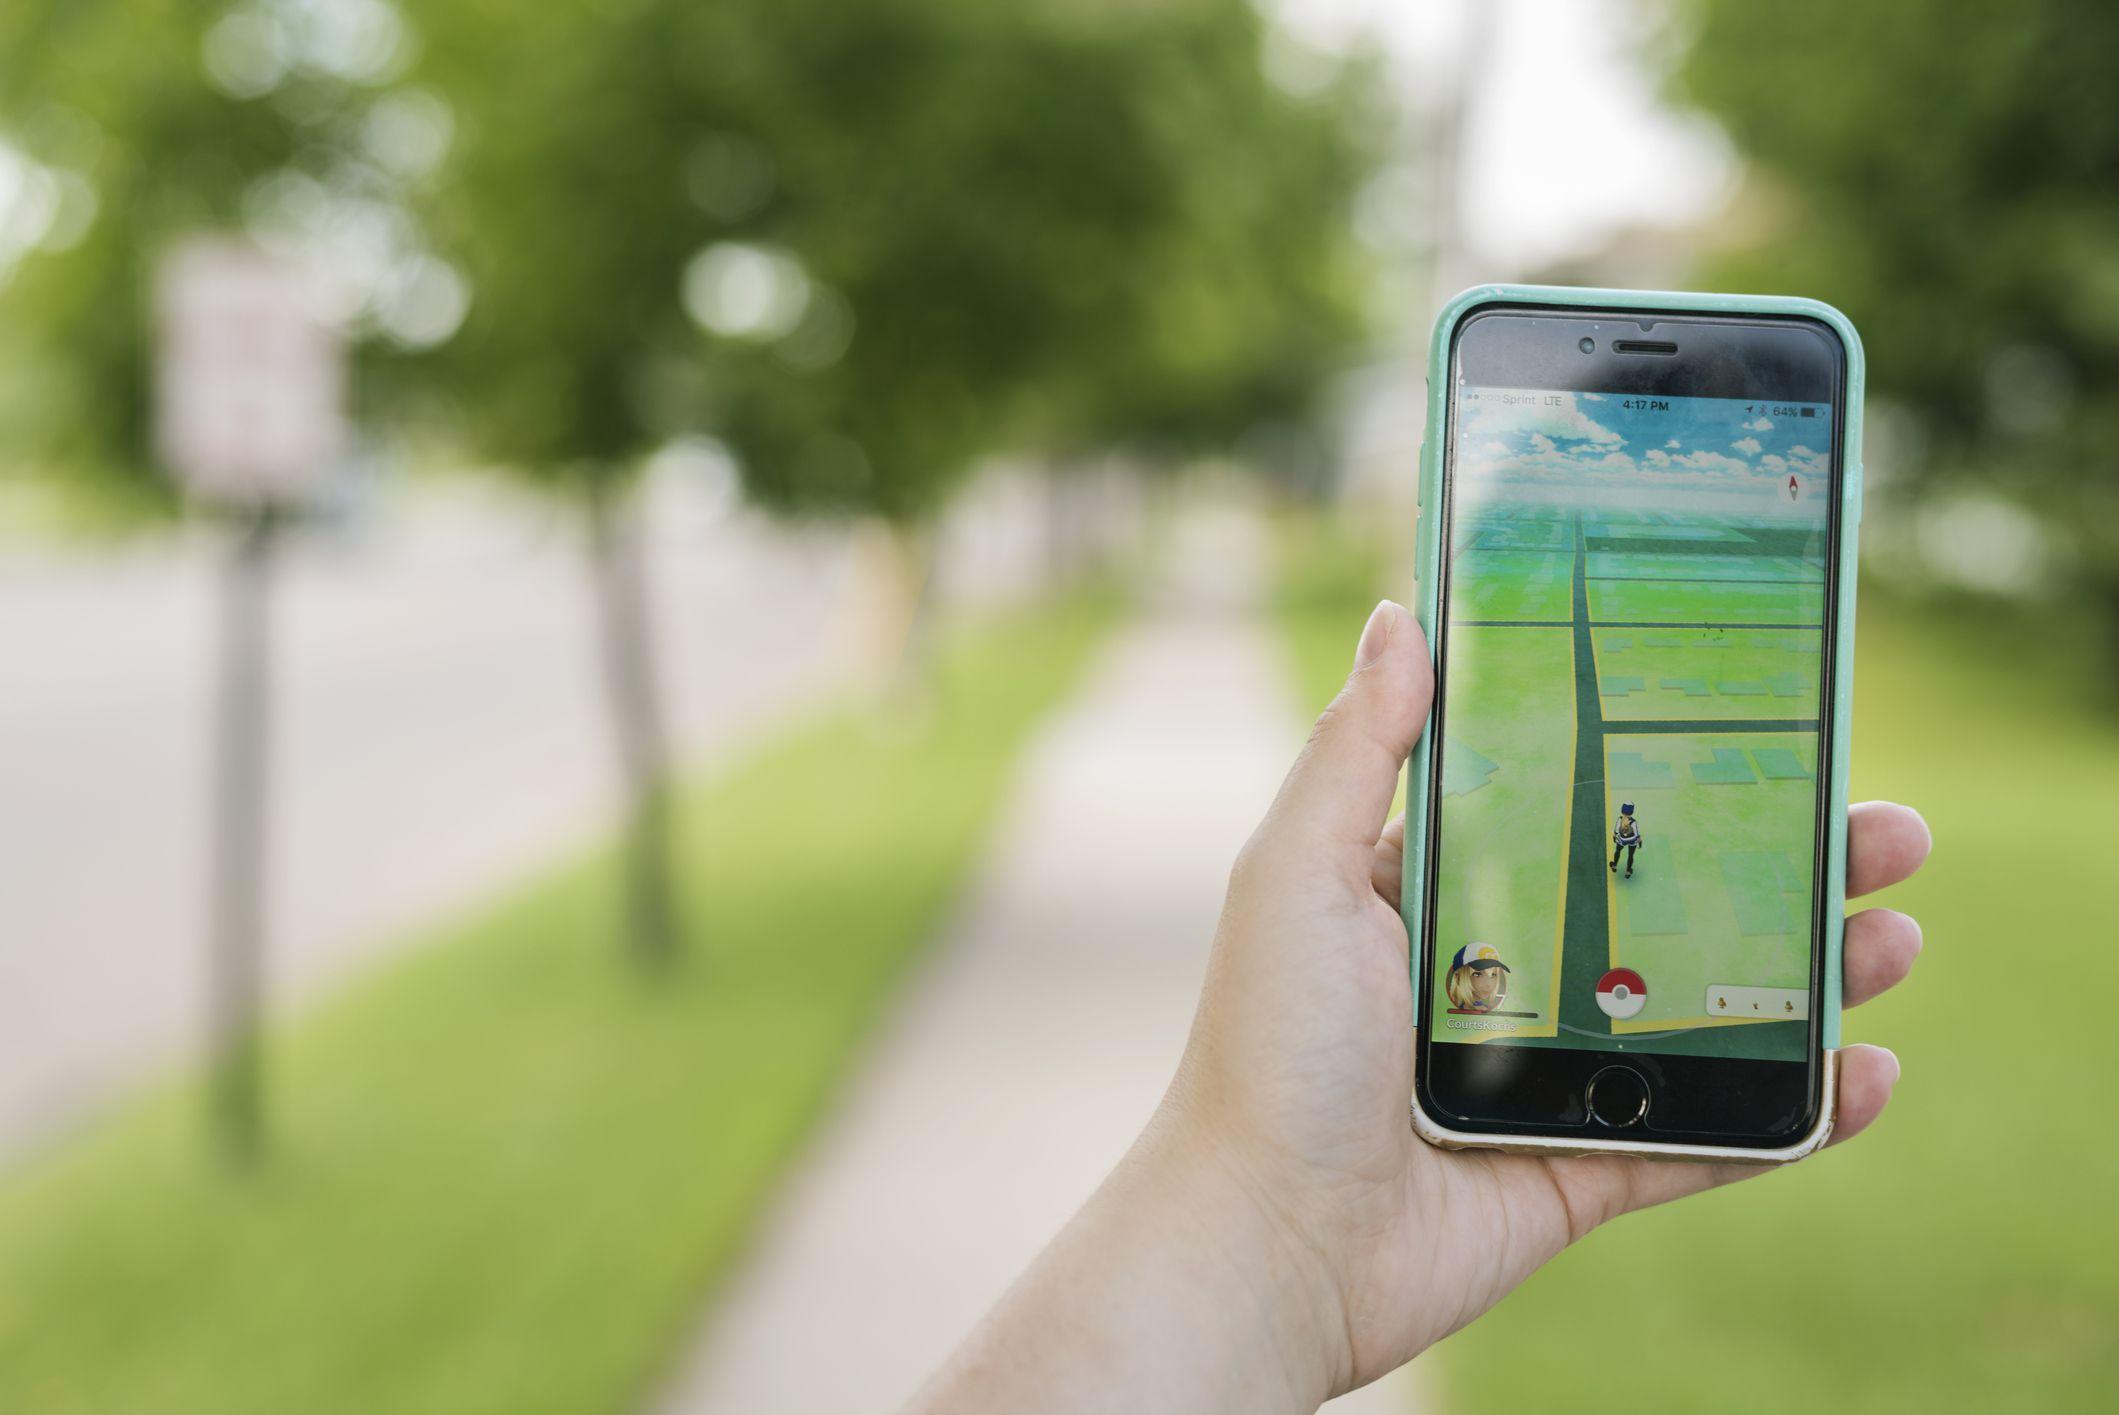 The Top 5 Pokemon Go Cheat Codes